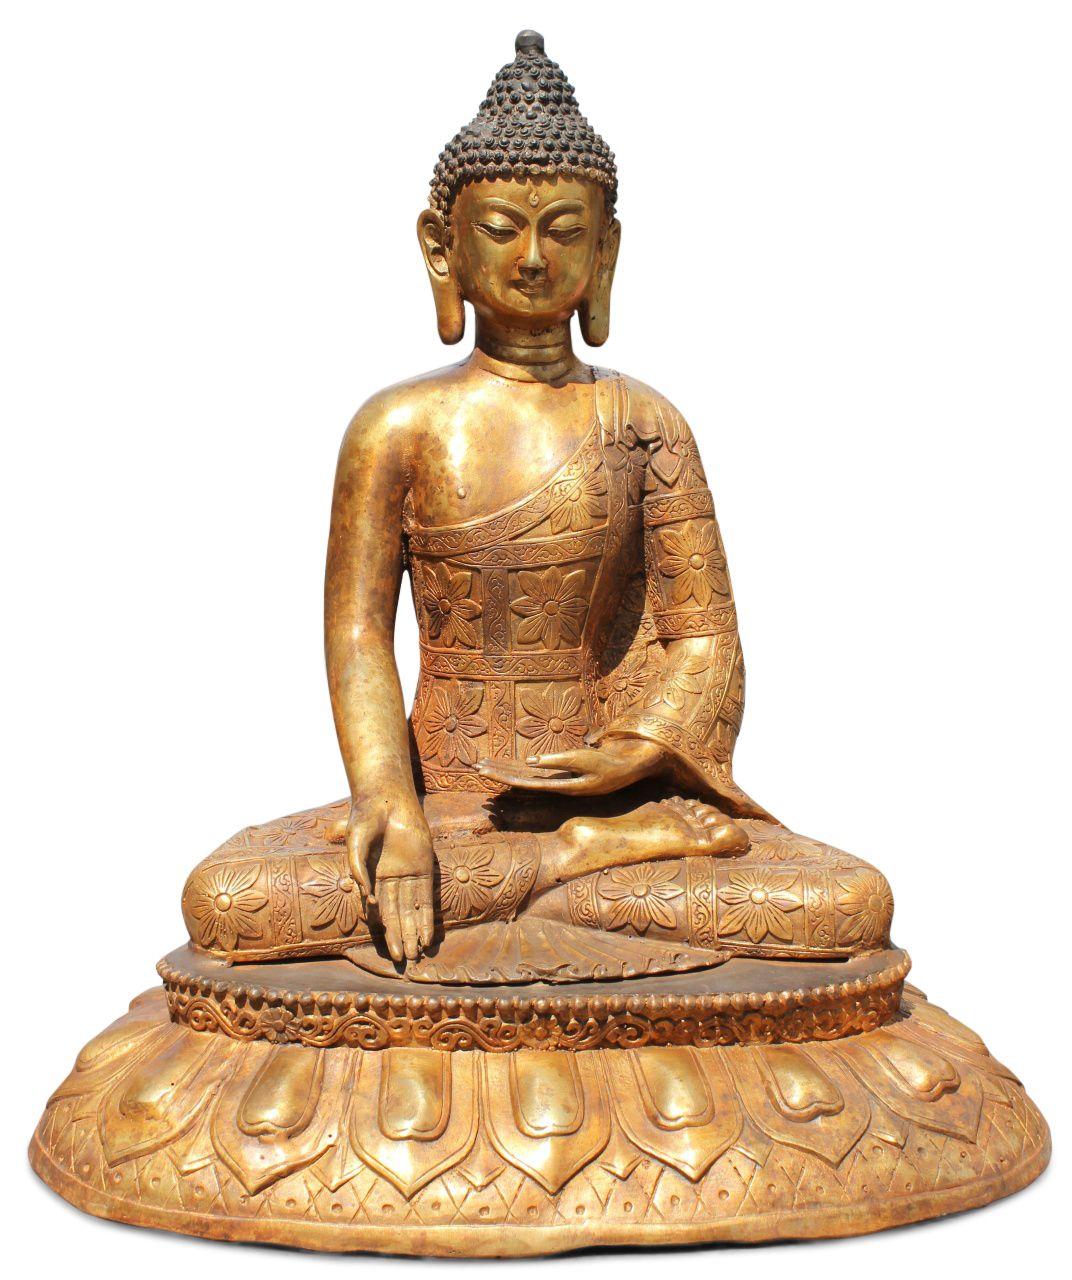 ratnasambhava buddha statue ratnasambhava figur online kaufen asien lifestyle. Black Bedroom Furniture Sets. Home Design Ideas